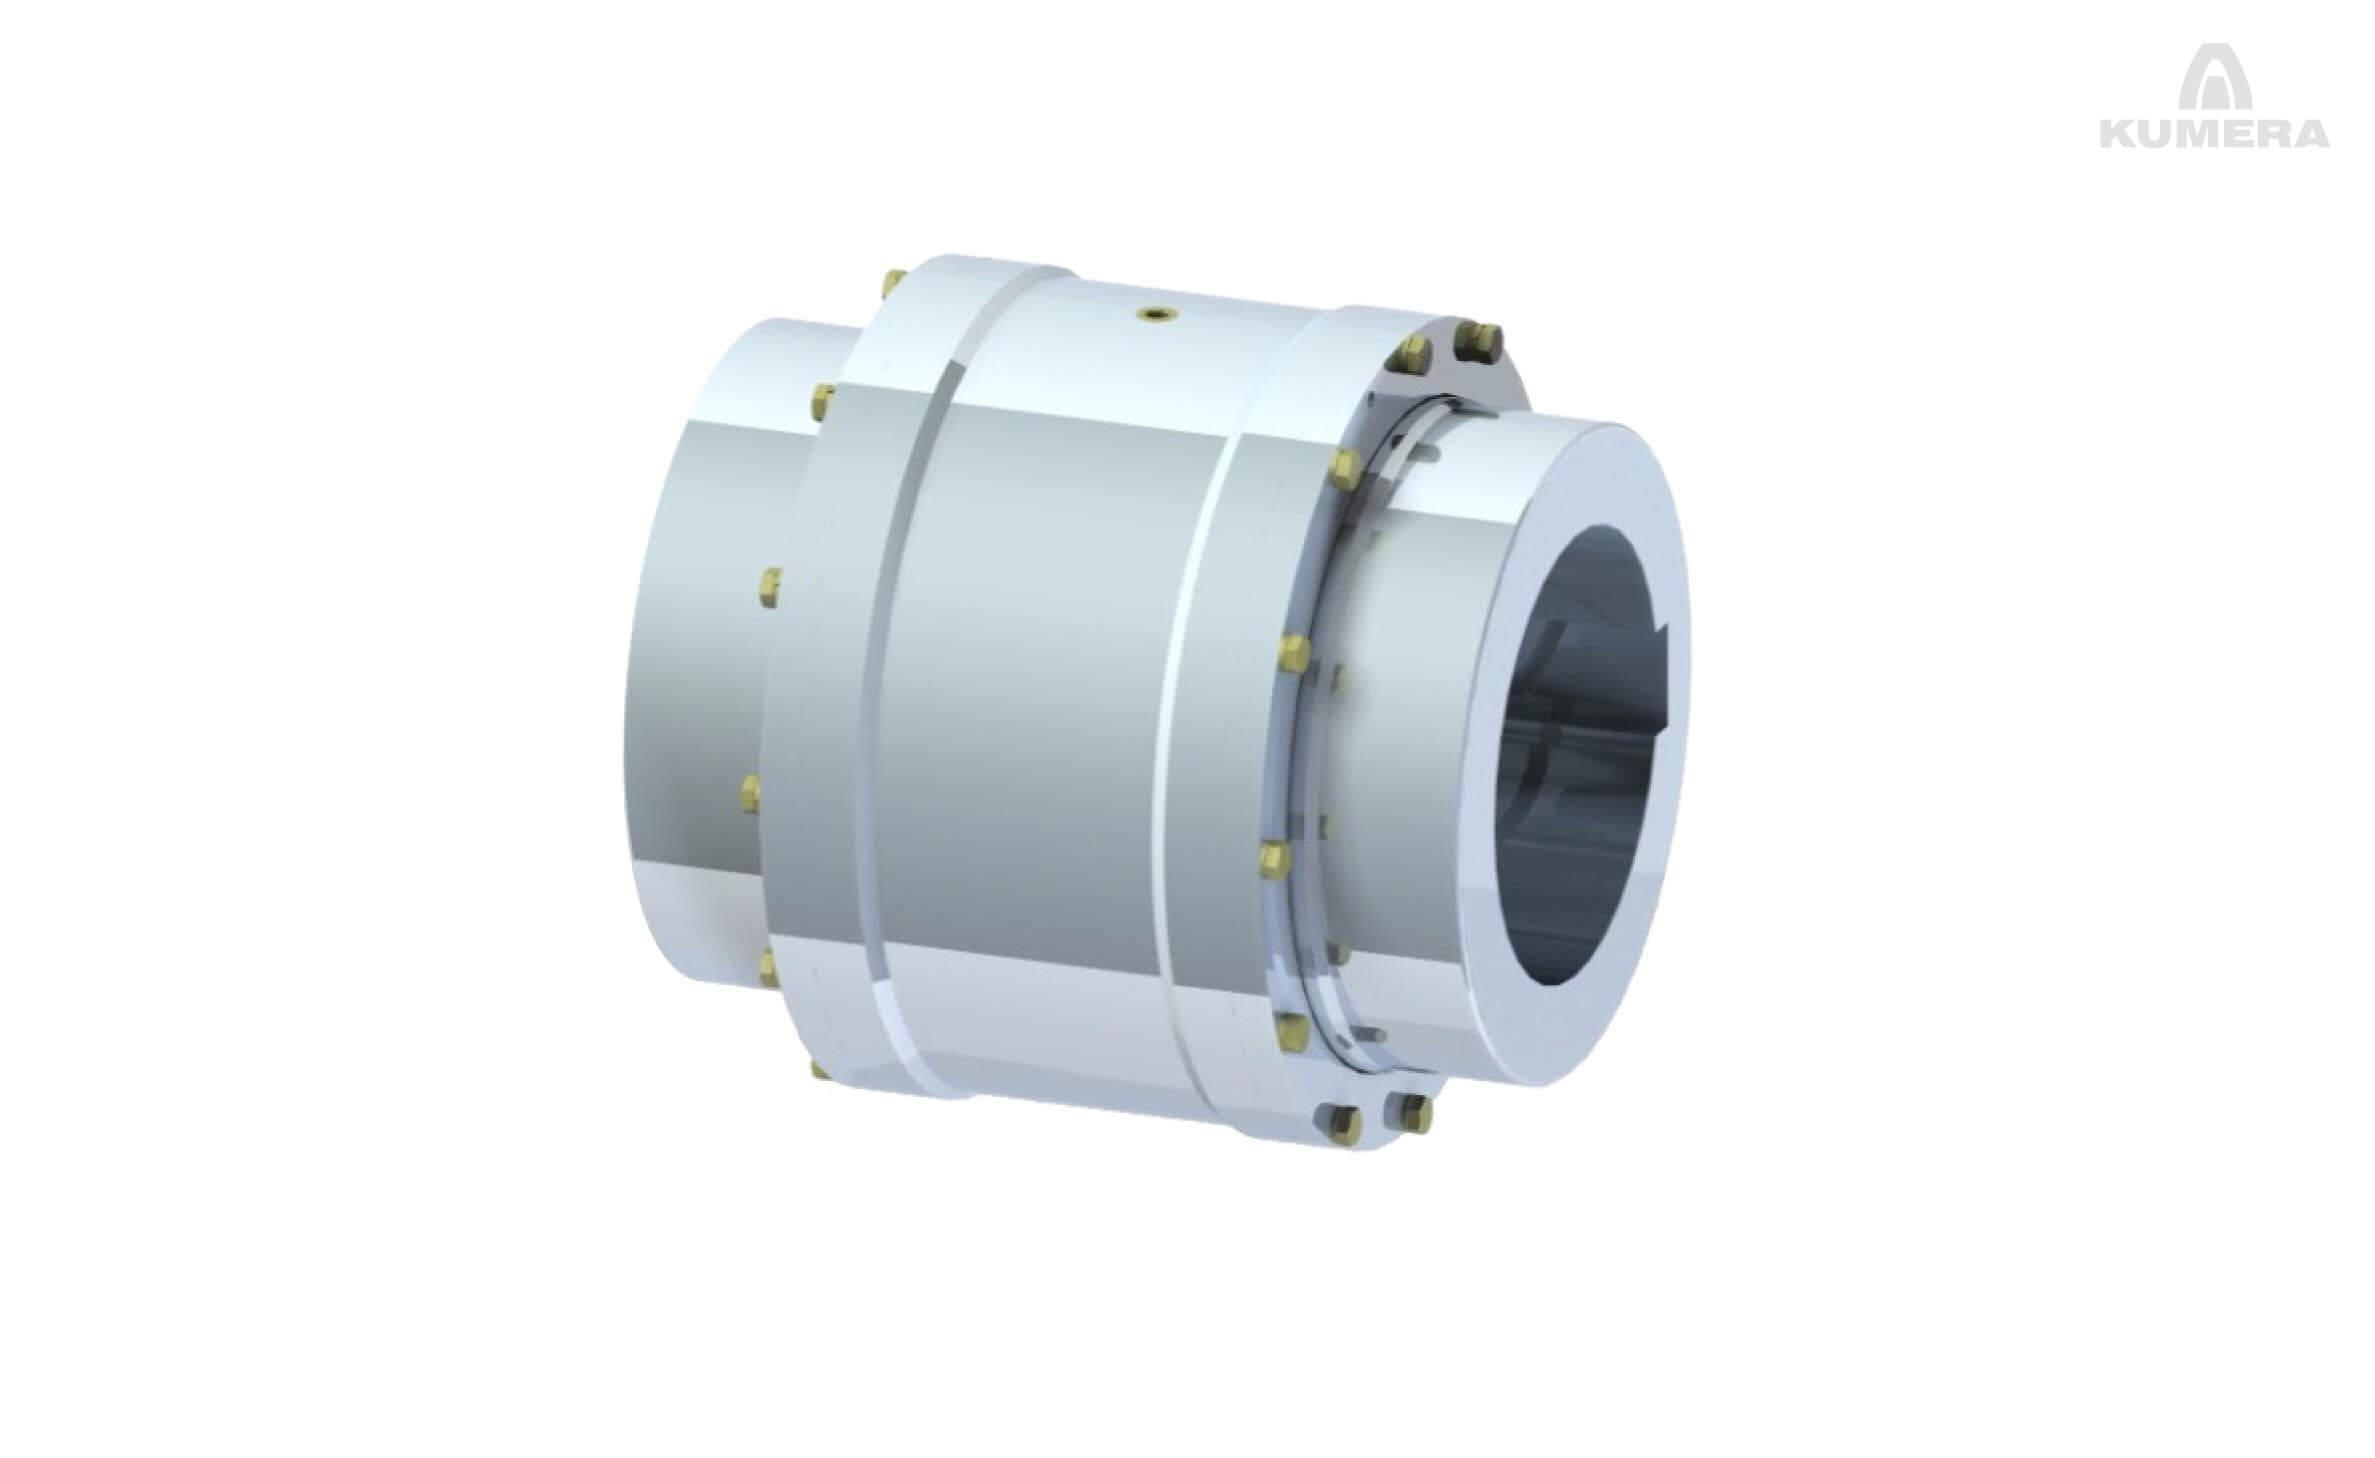 Kumera Gear Couplings. Cumex - Construction and operating characteristics. Standard types KKA, KKB, KKS, KKV and KKP.